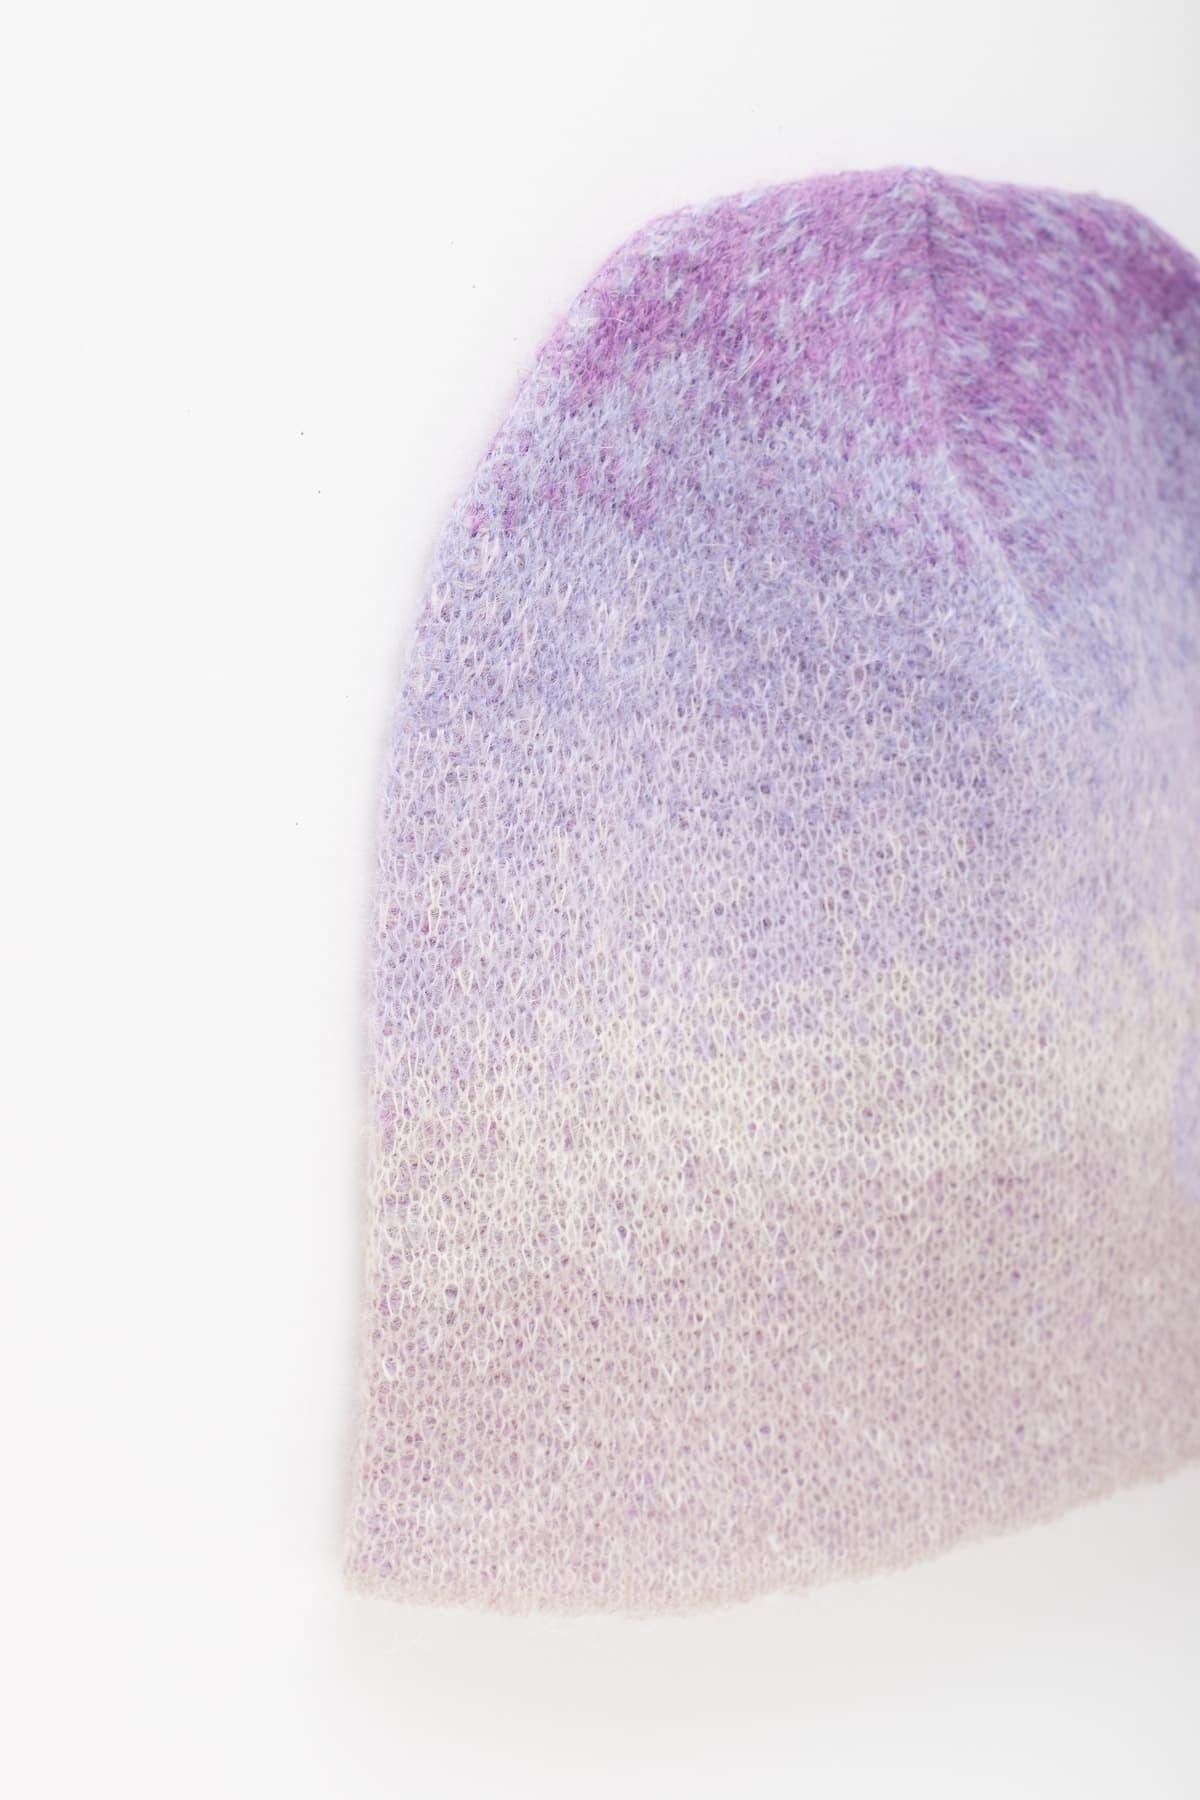 Acne Studios Sea Foam Green Extorr Logo Label T-Shirt